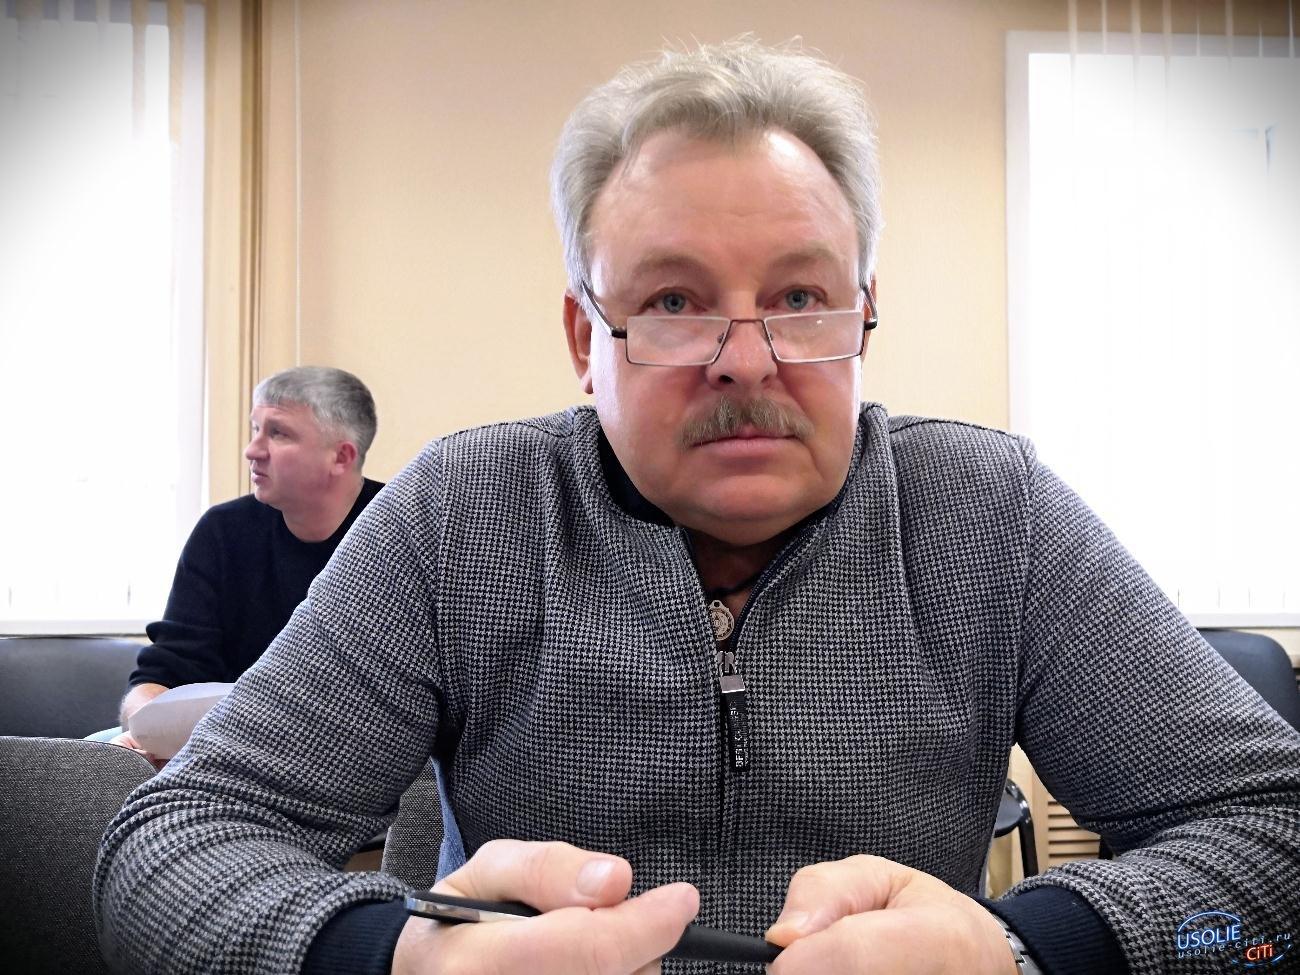 Александр Стародубцев предупреждает усольчан